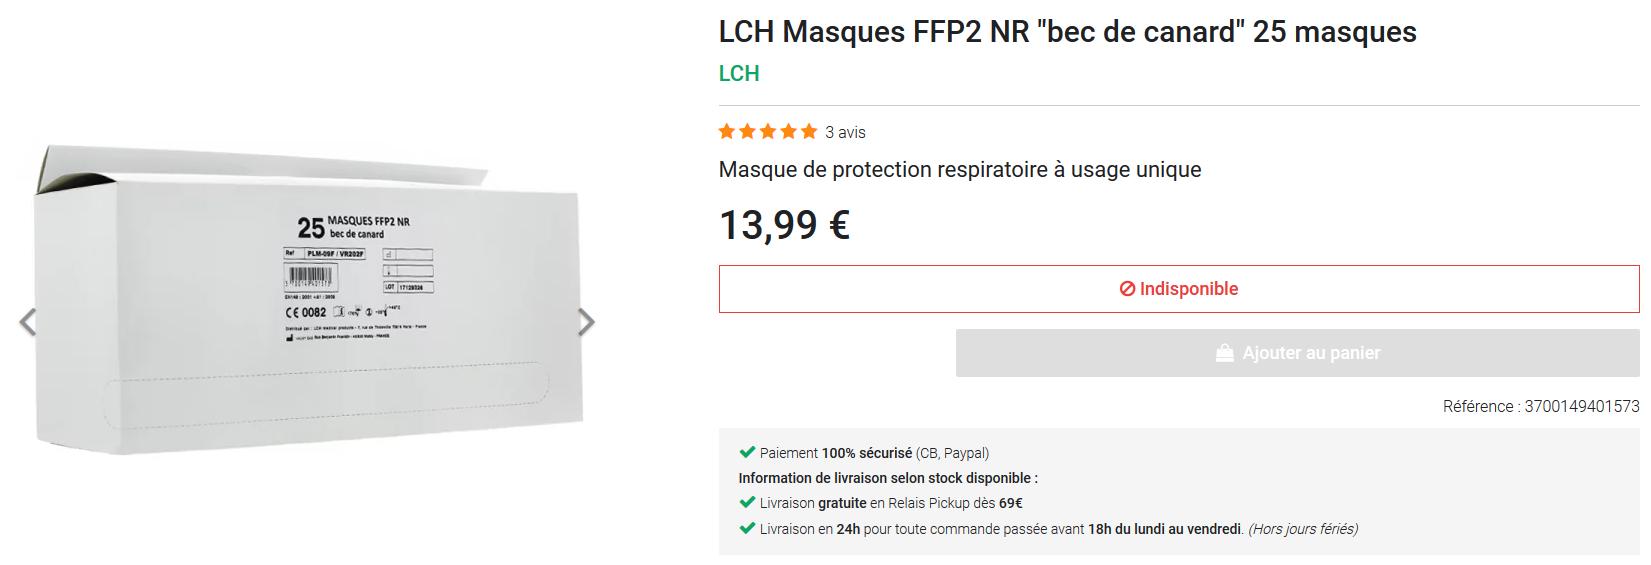 Screenshot_2020-03-14 LCH FFP2 NR أقنعة بط منقار البط 25 Pharma GDD masks.png